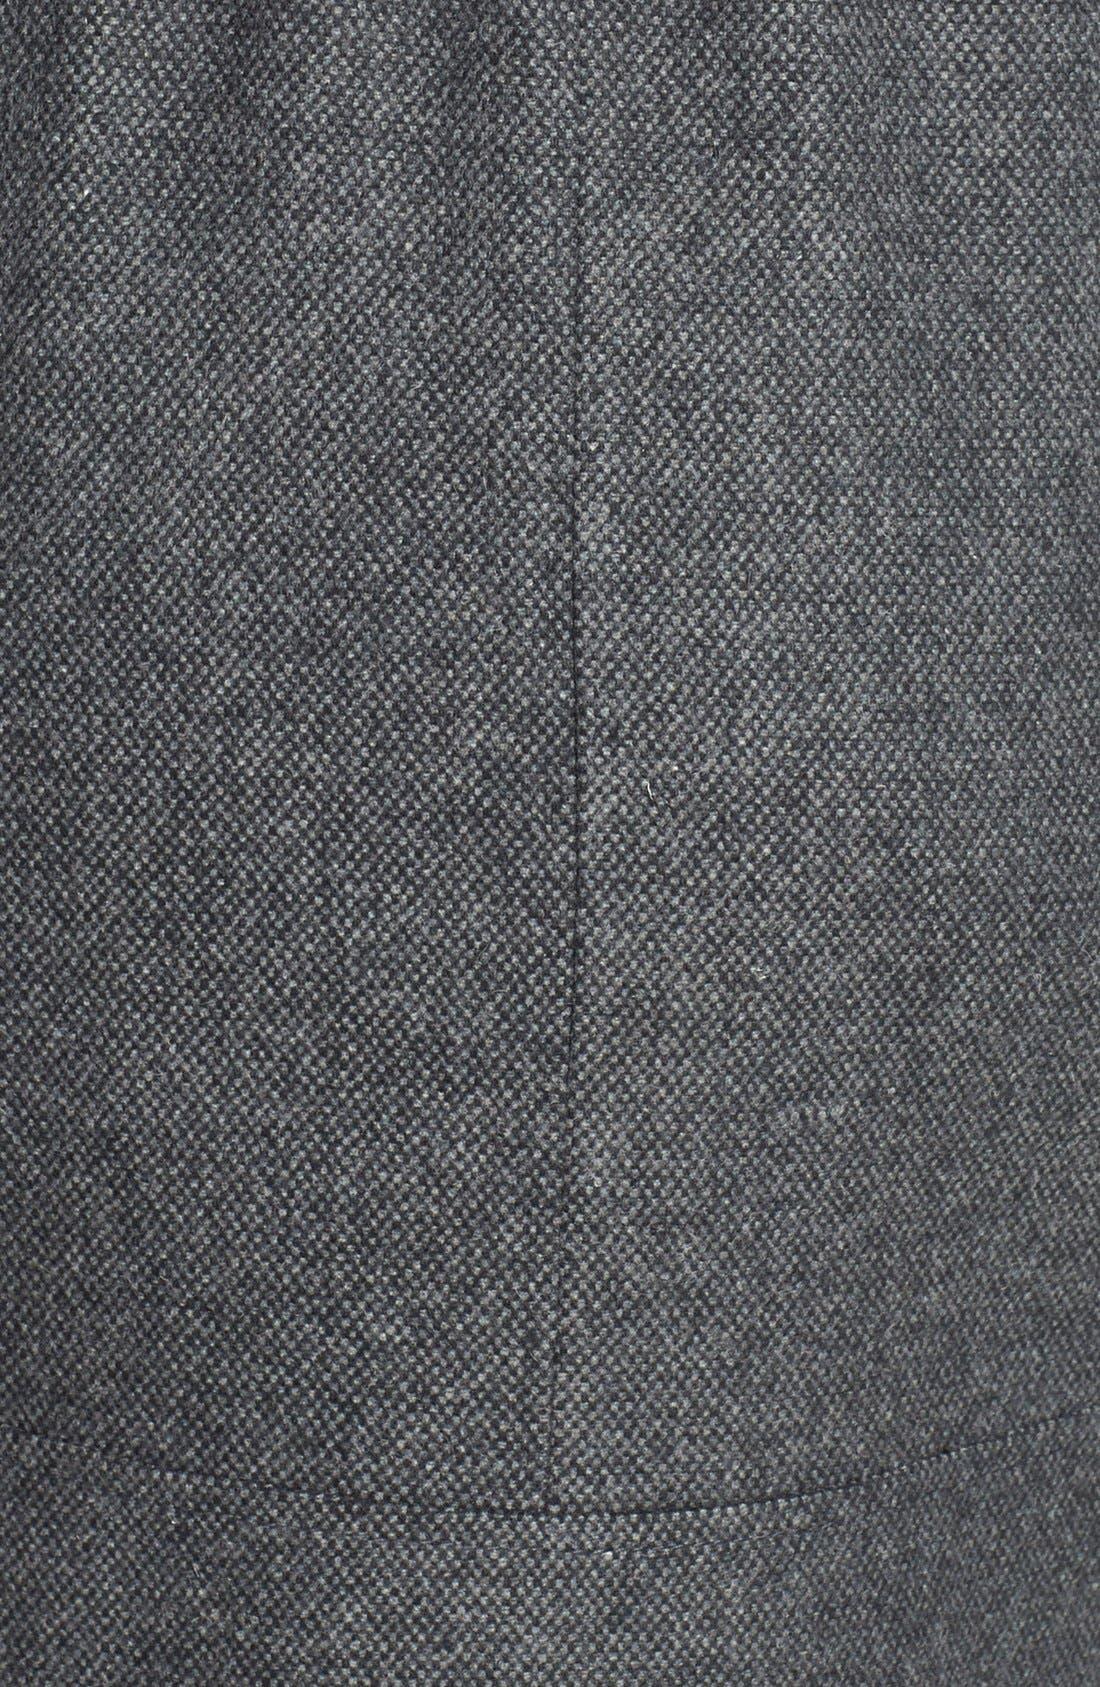 Alternate Image 4  - Laundry by Shelli Segal Faux Fur Trim Colorblock Tweed Coat